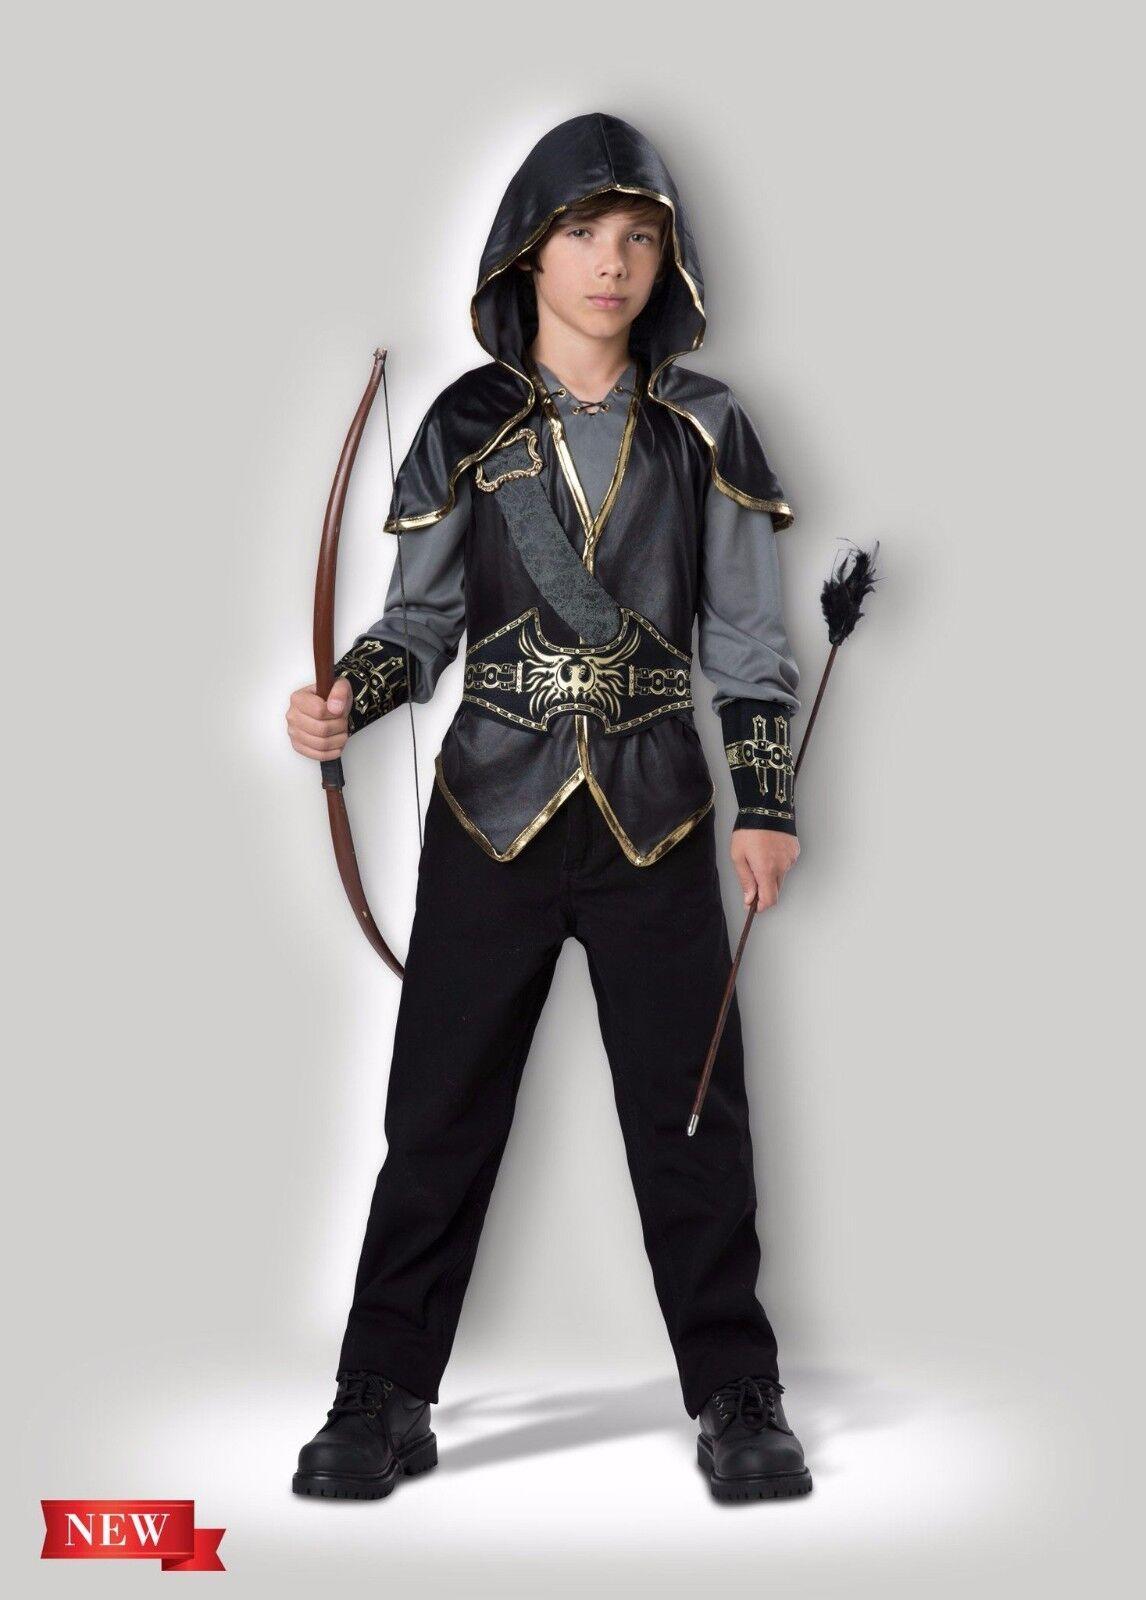 Incharacter Hooded Huntsman Bowman Hunter Child Boys Halloween Costume 17108